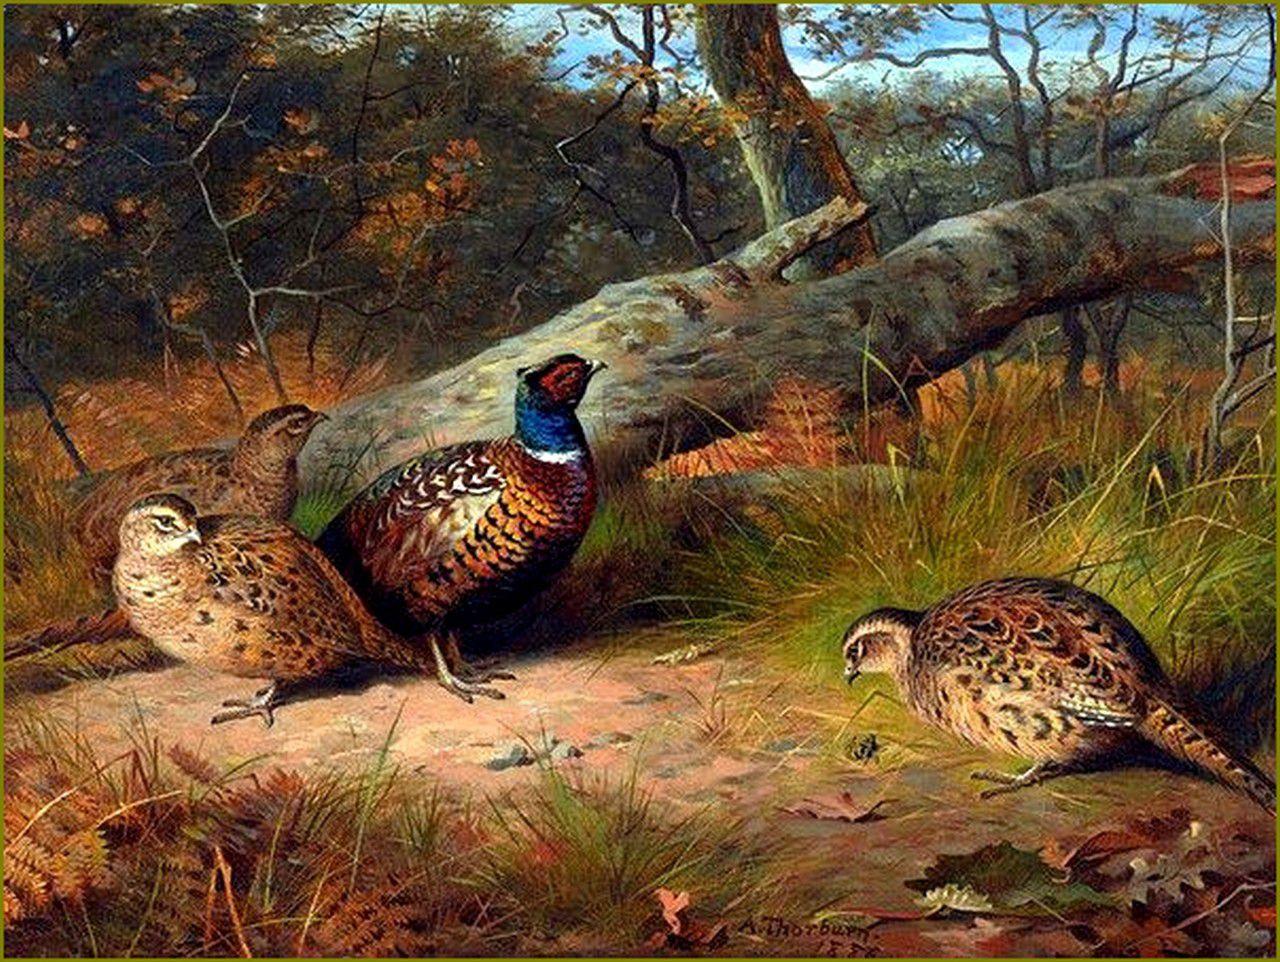 Oiseaux en peinture -Archibald Thorburn